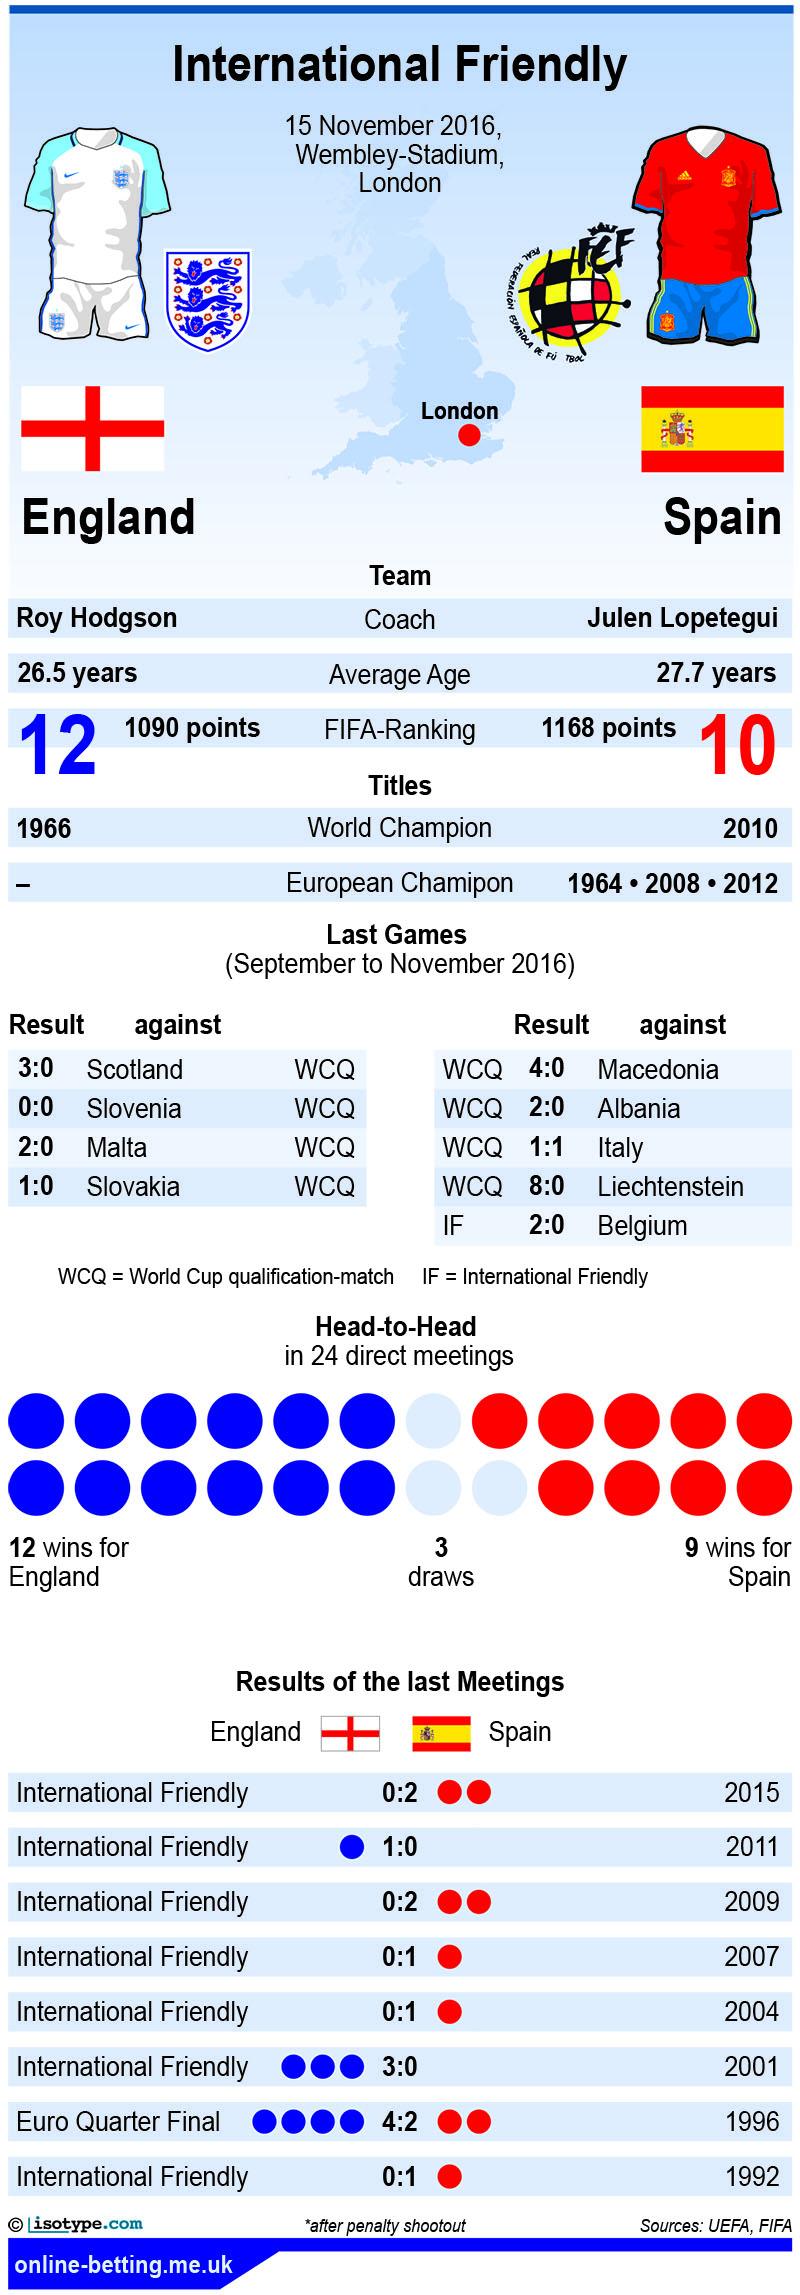 England v Spain 2016 infographic